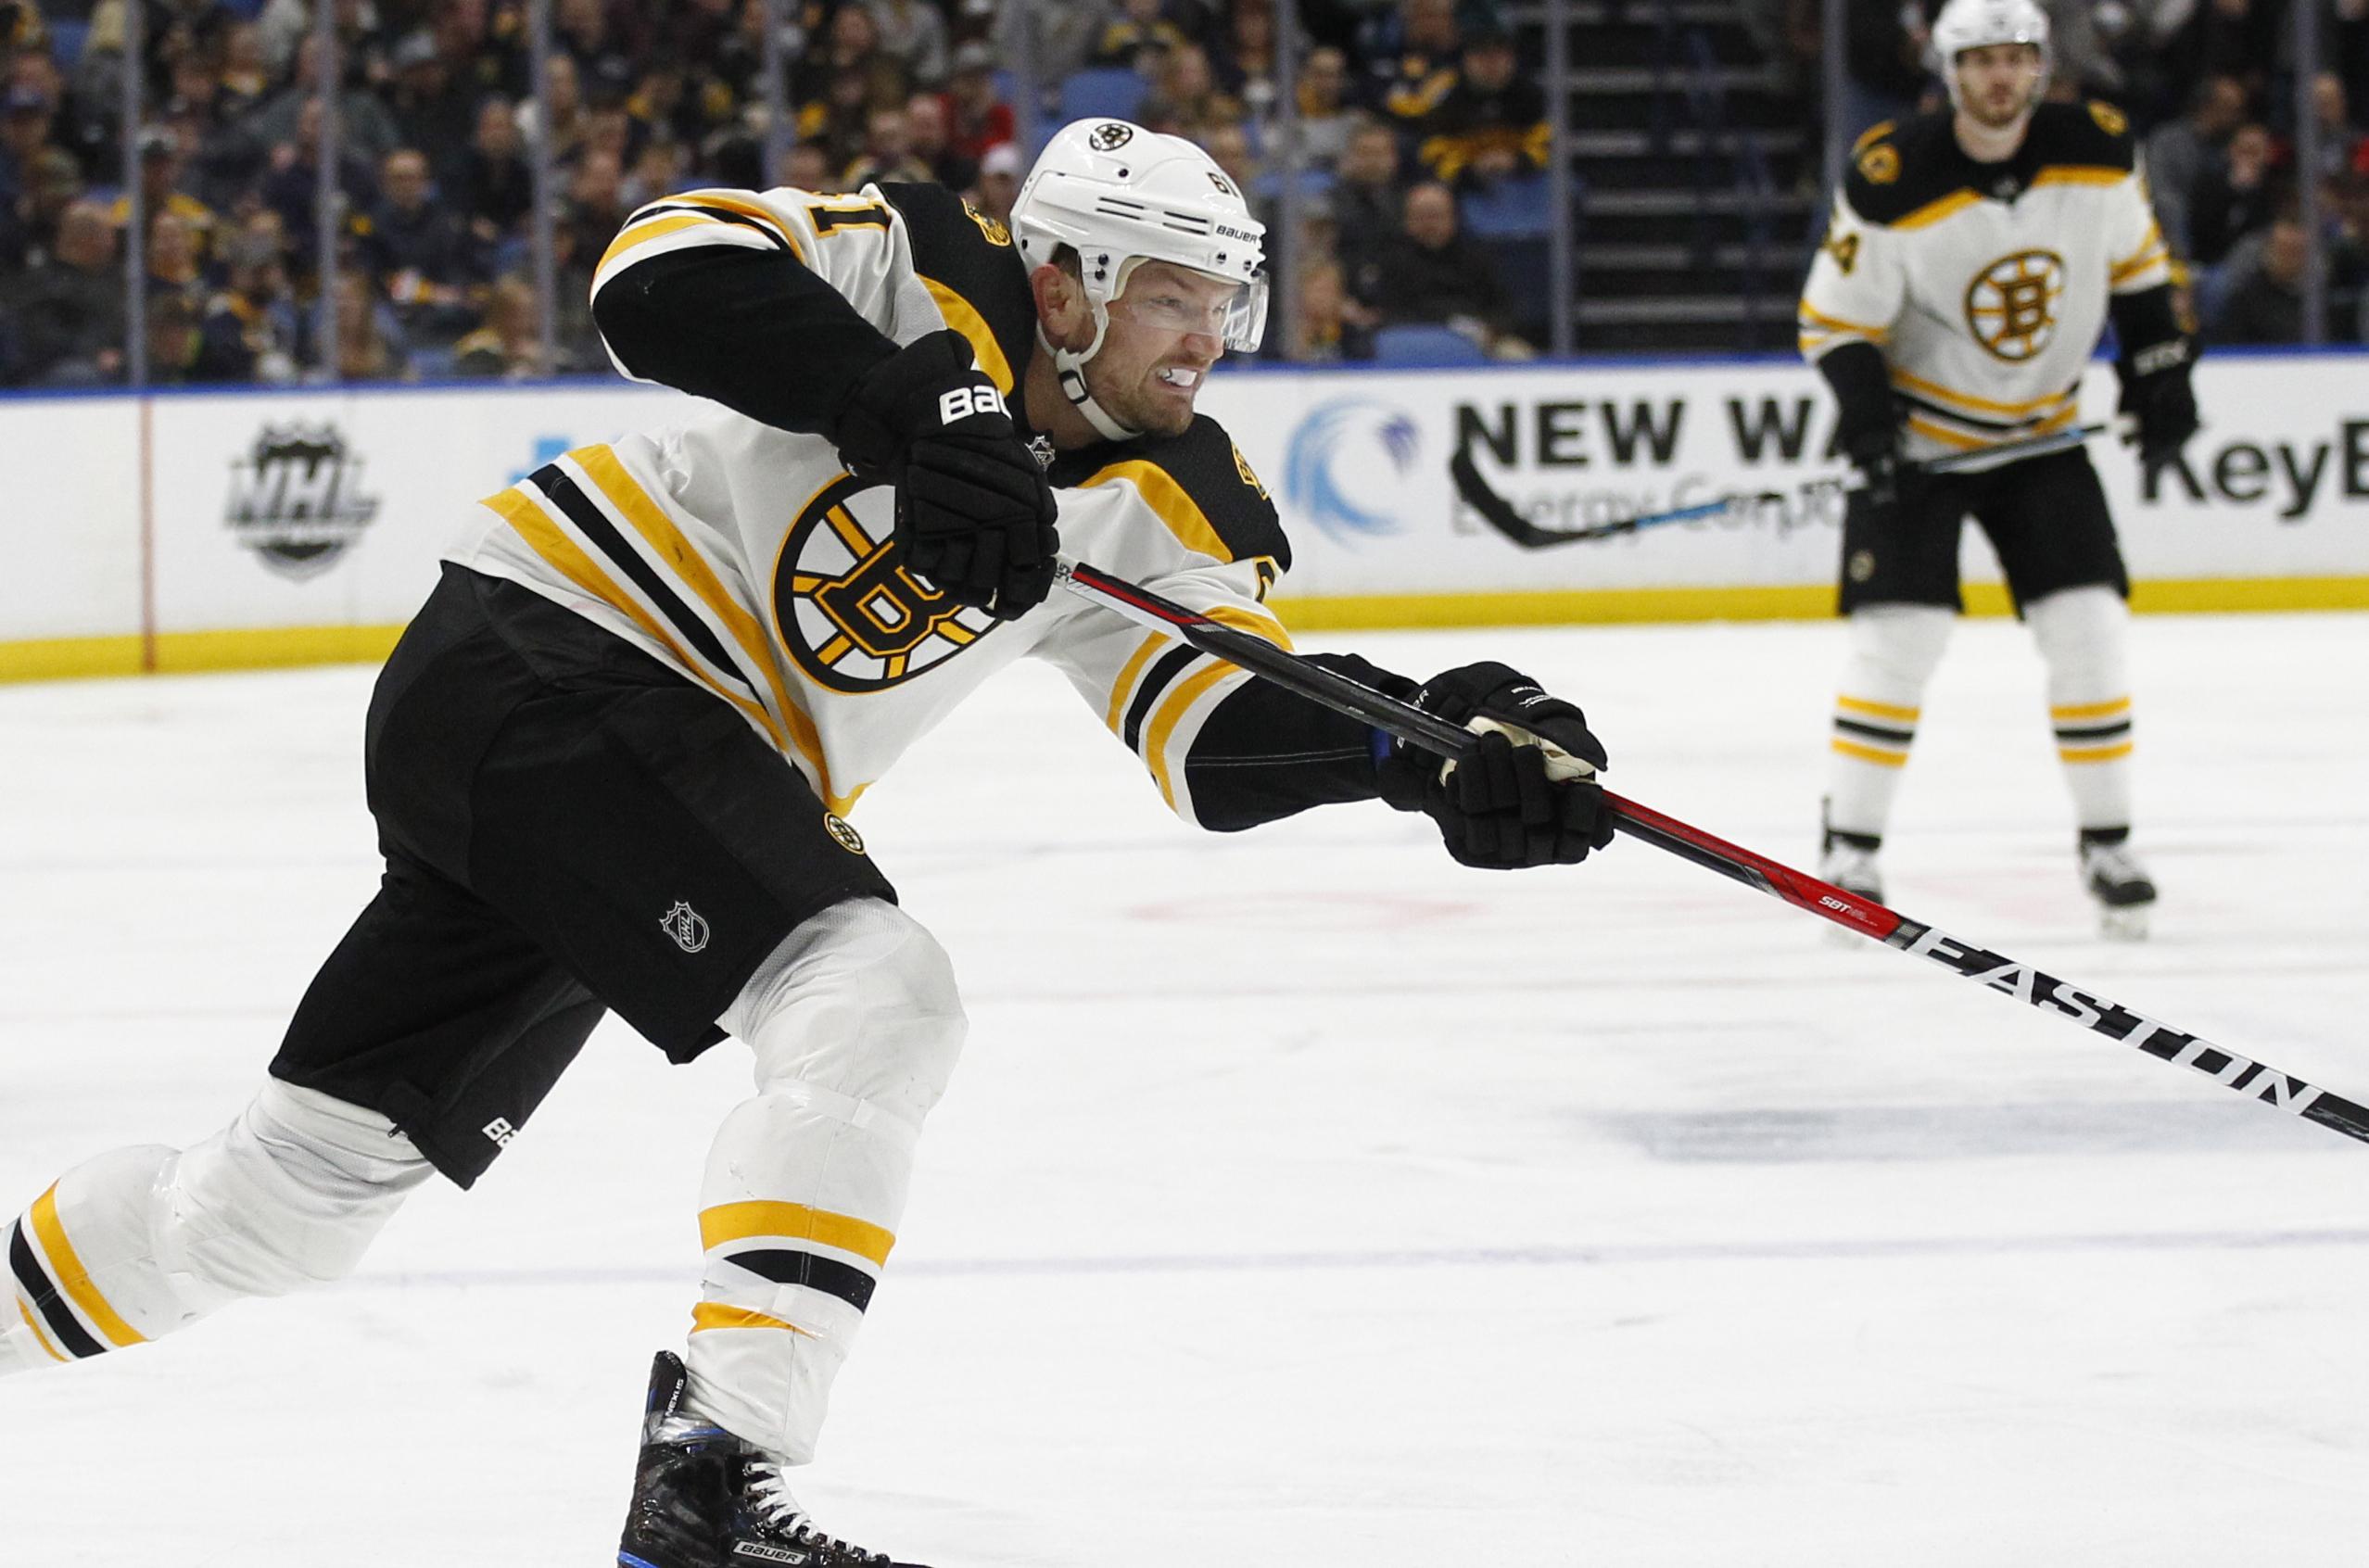 Bruins_sabres_hockey_59013